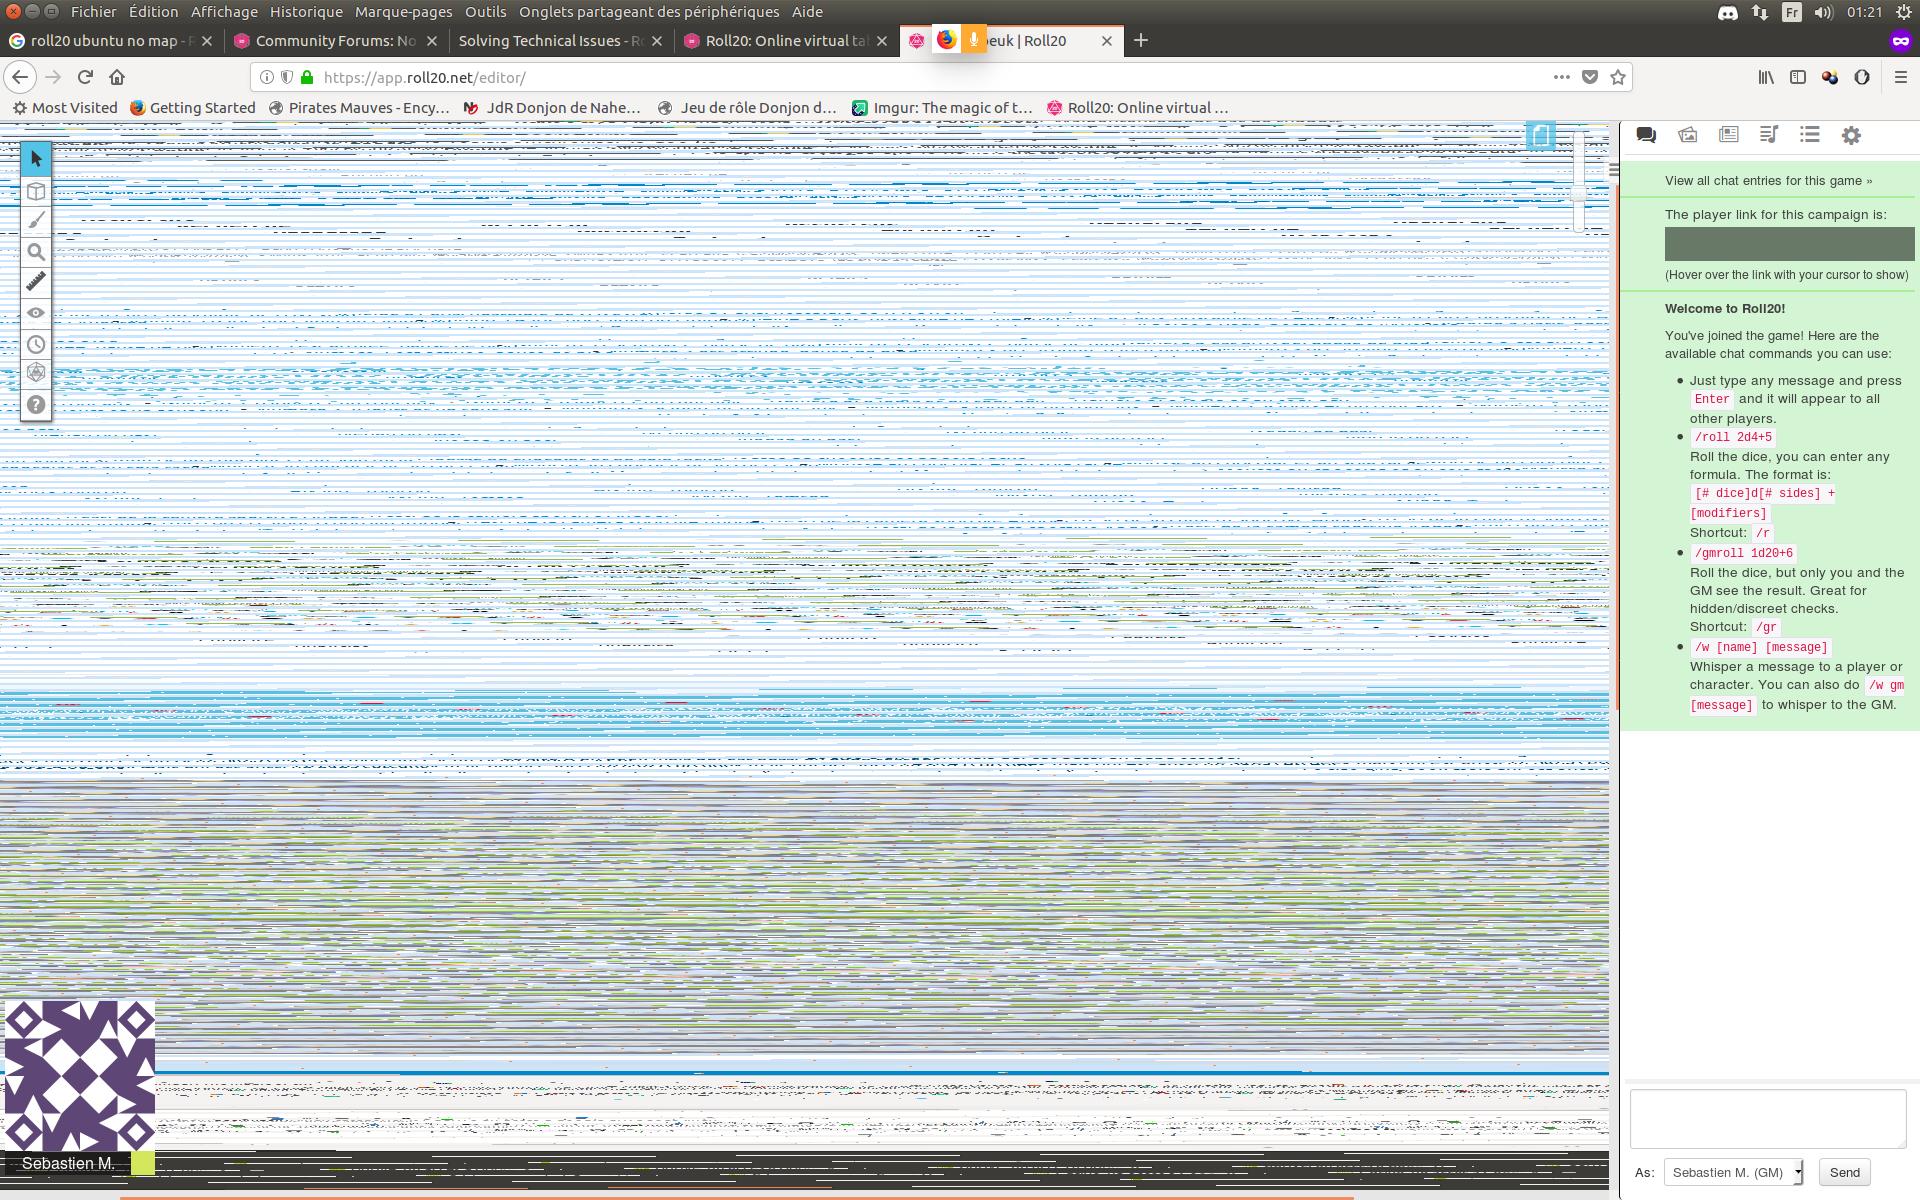 telecharger google chrome ubuntu 16.04